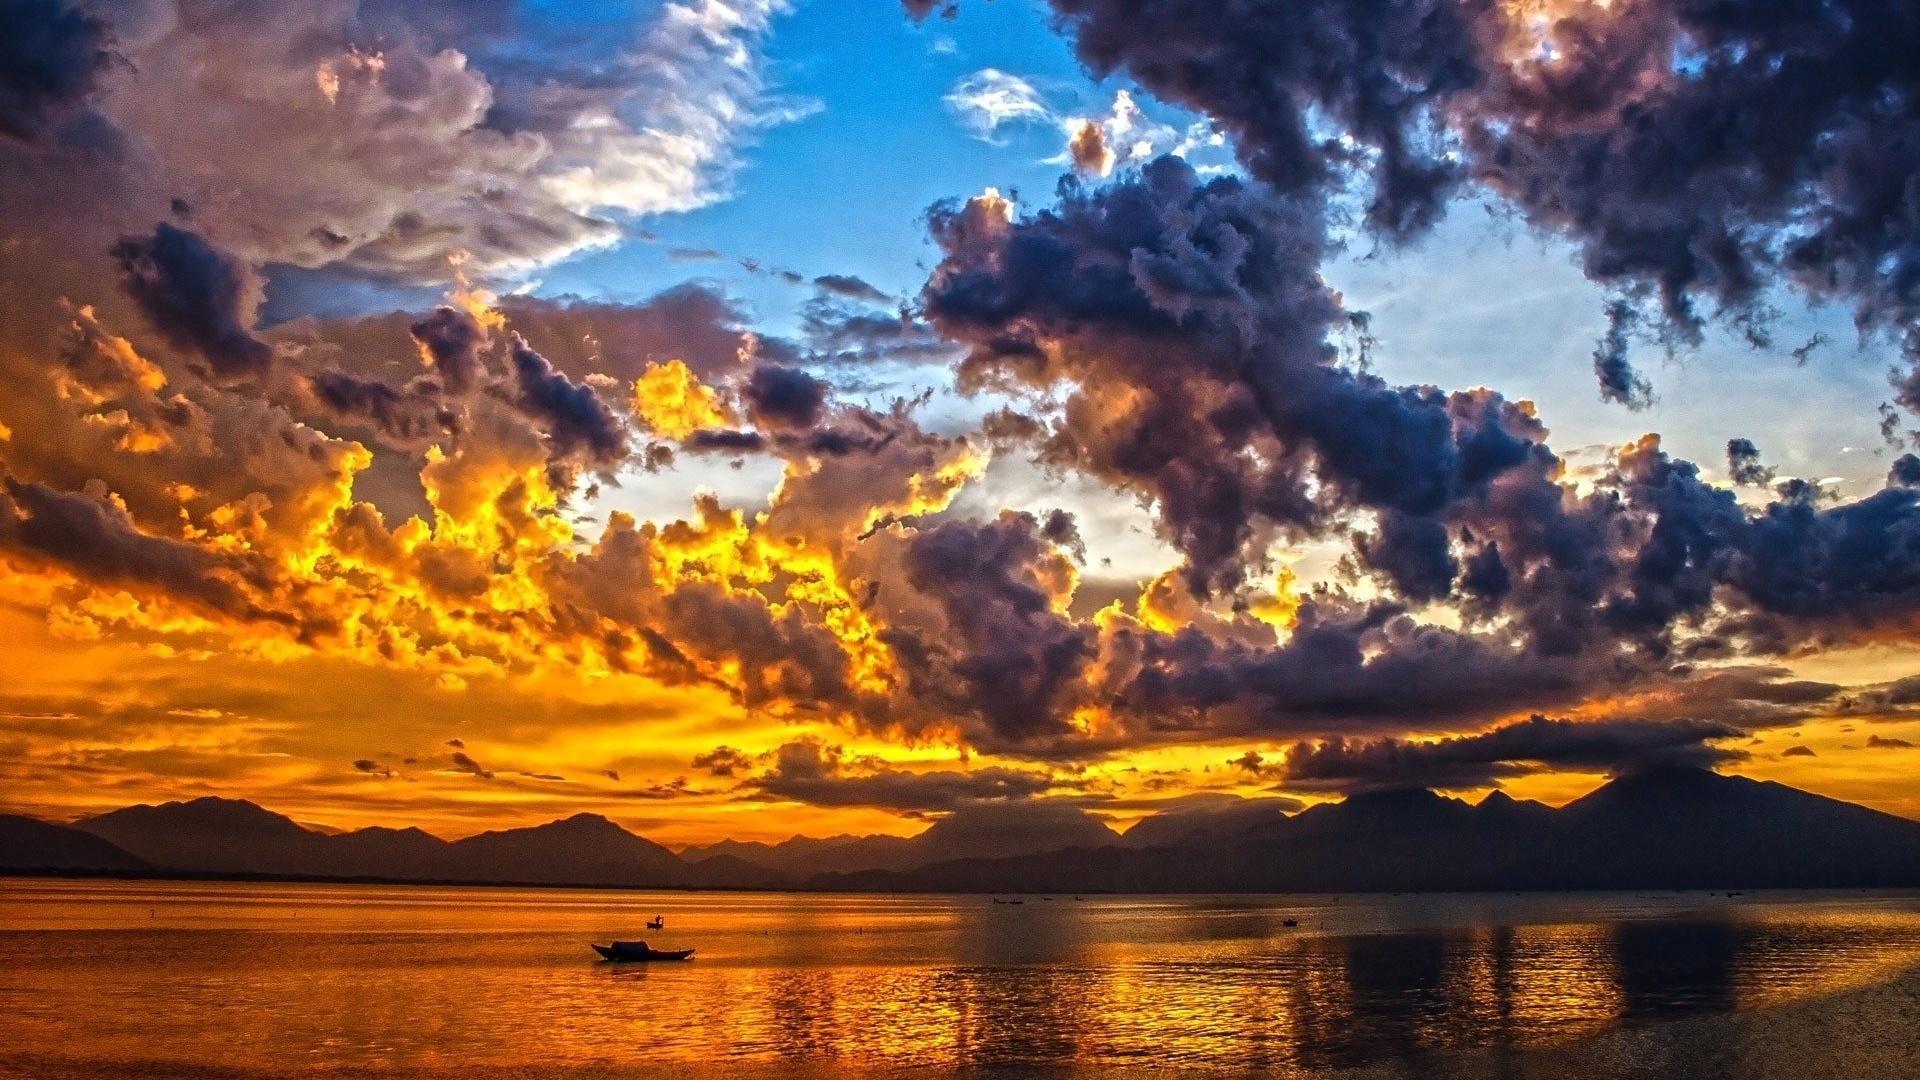 небо, облака, рыбаки, природа, красота